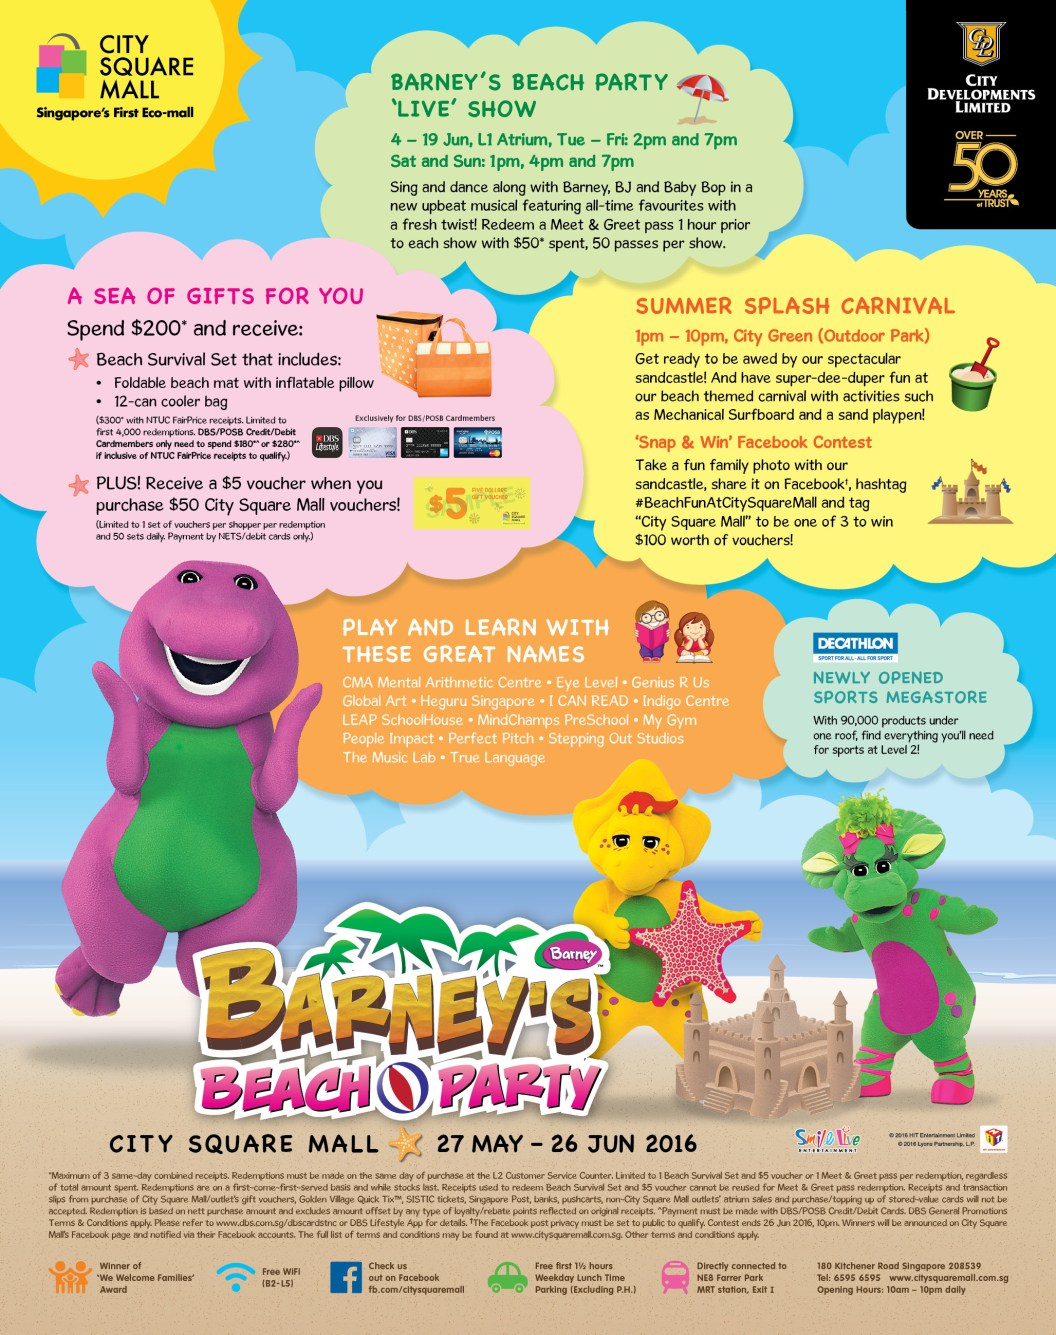 Barneys Beach Party At City Square Mall 27 May 26 June 2016